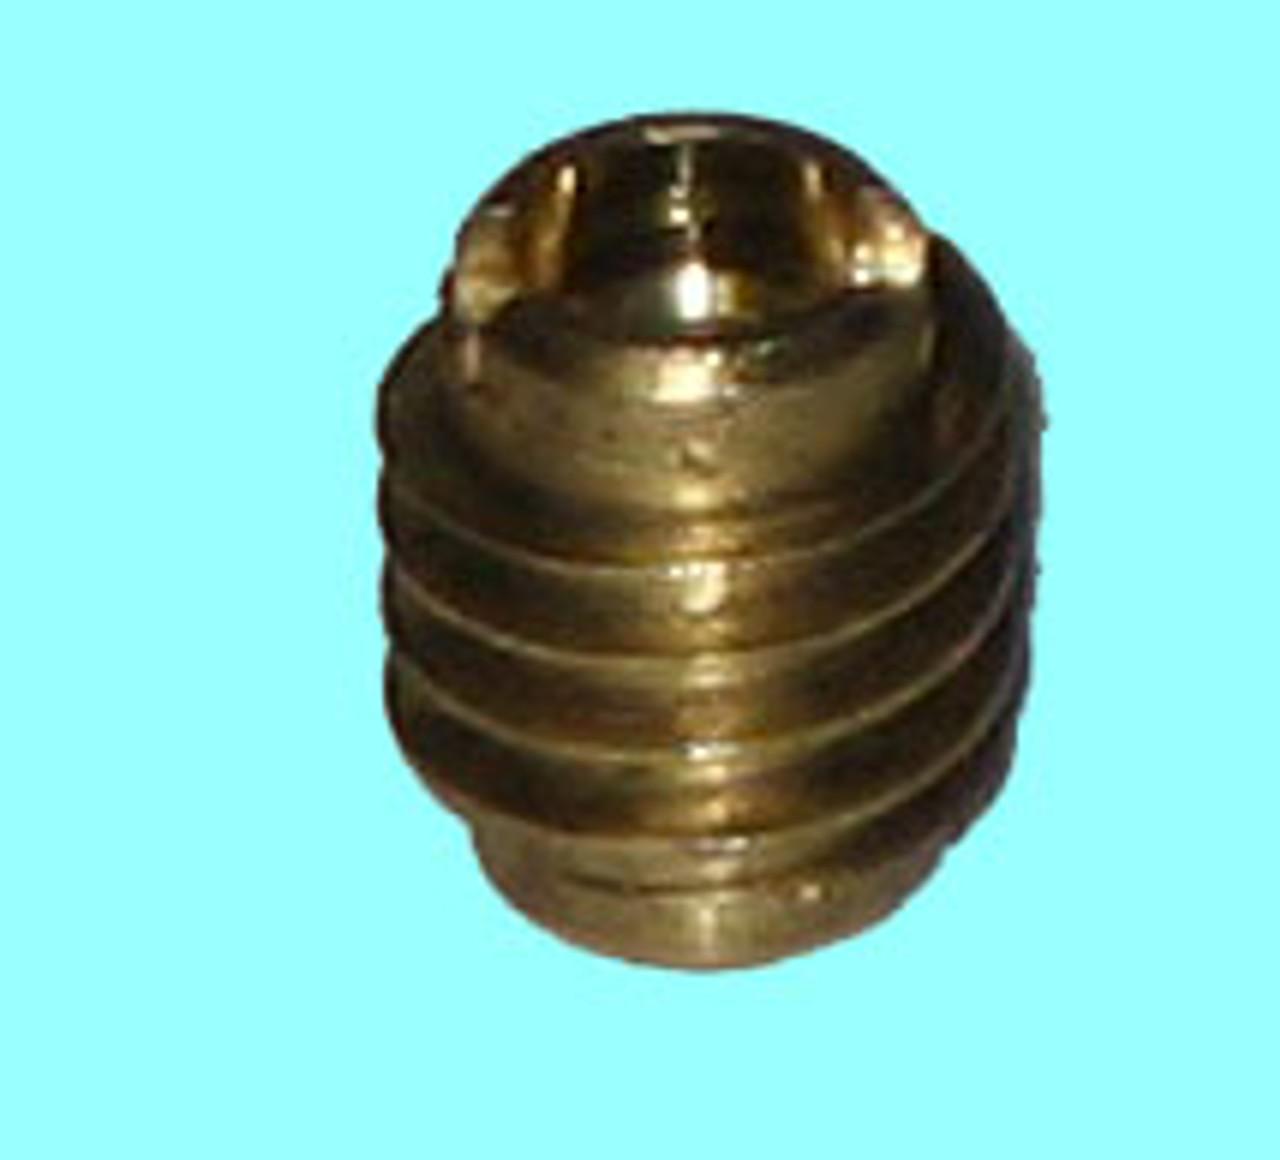 10-32 Brass Threaded Insert Ez Lok